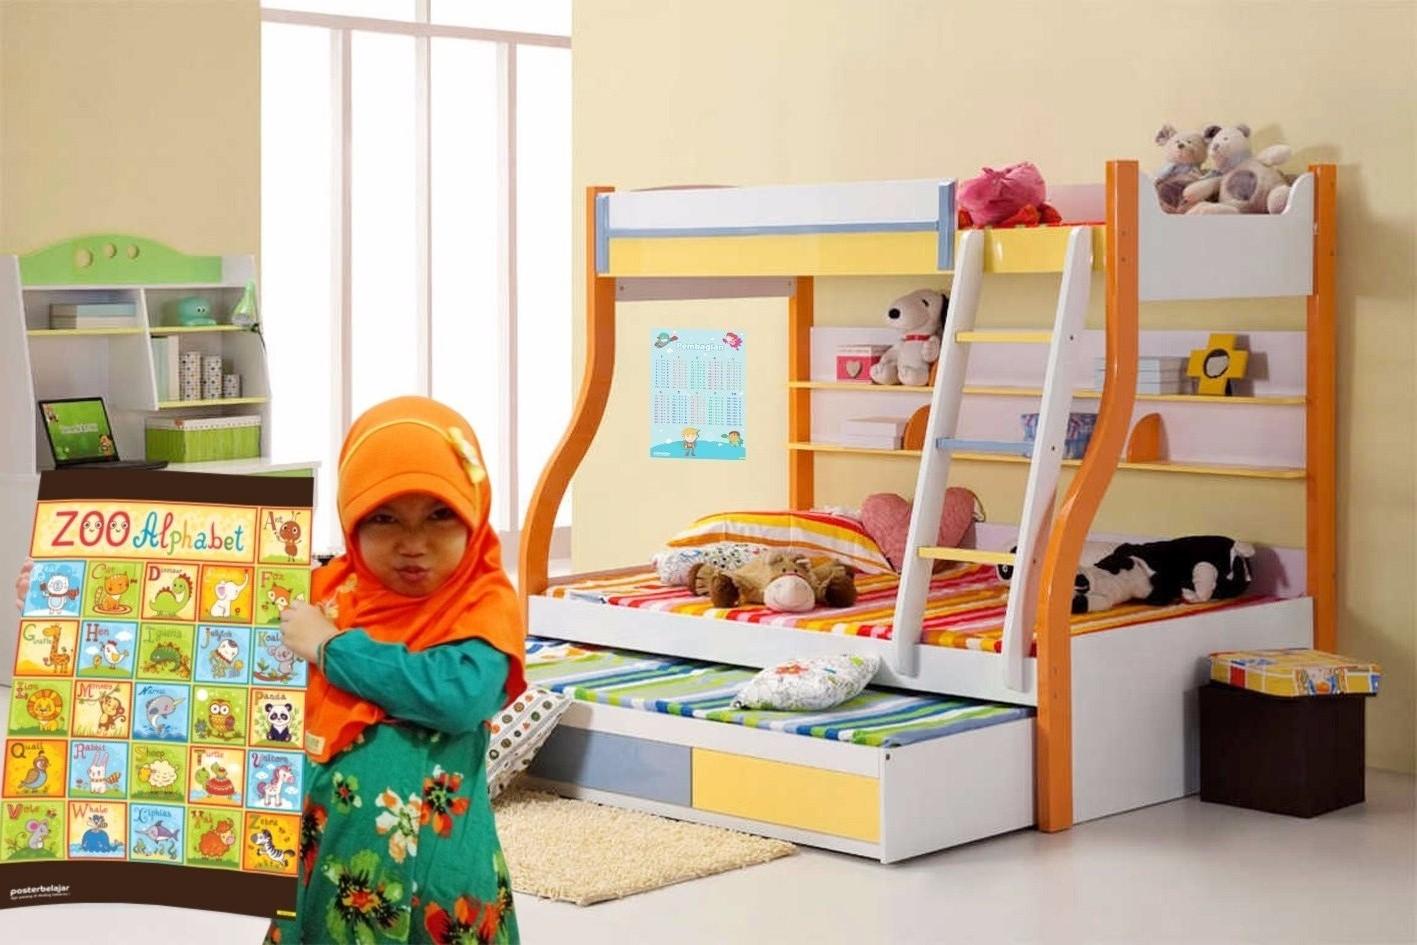 fatiyya-tips-cara-mendidik-anak-pintar-cerdas-shalih-sholeh-kreatif-poster-belajar-pendidikan-mainan-edukatif-edukasi.jpg